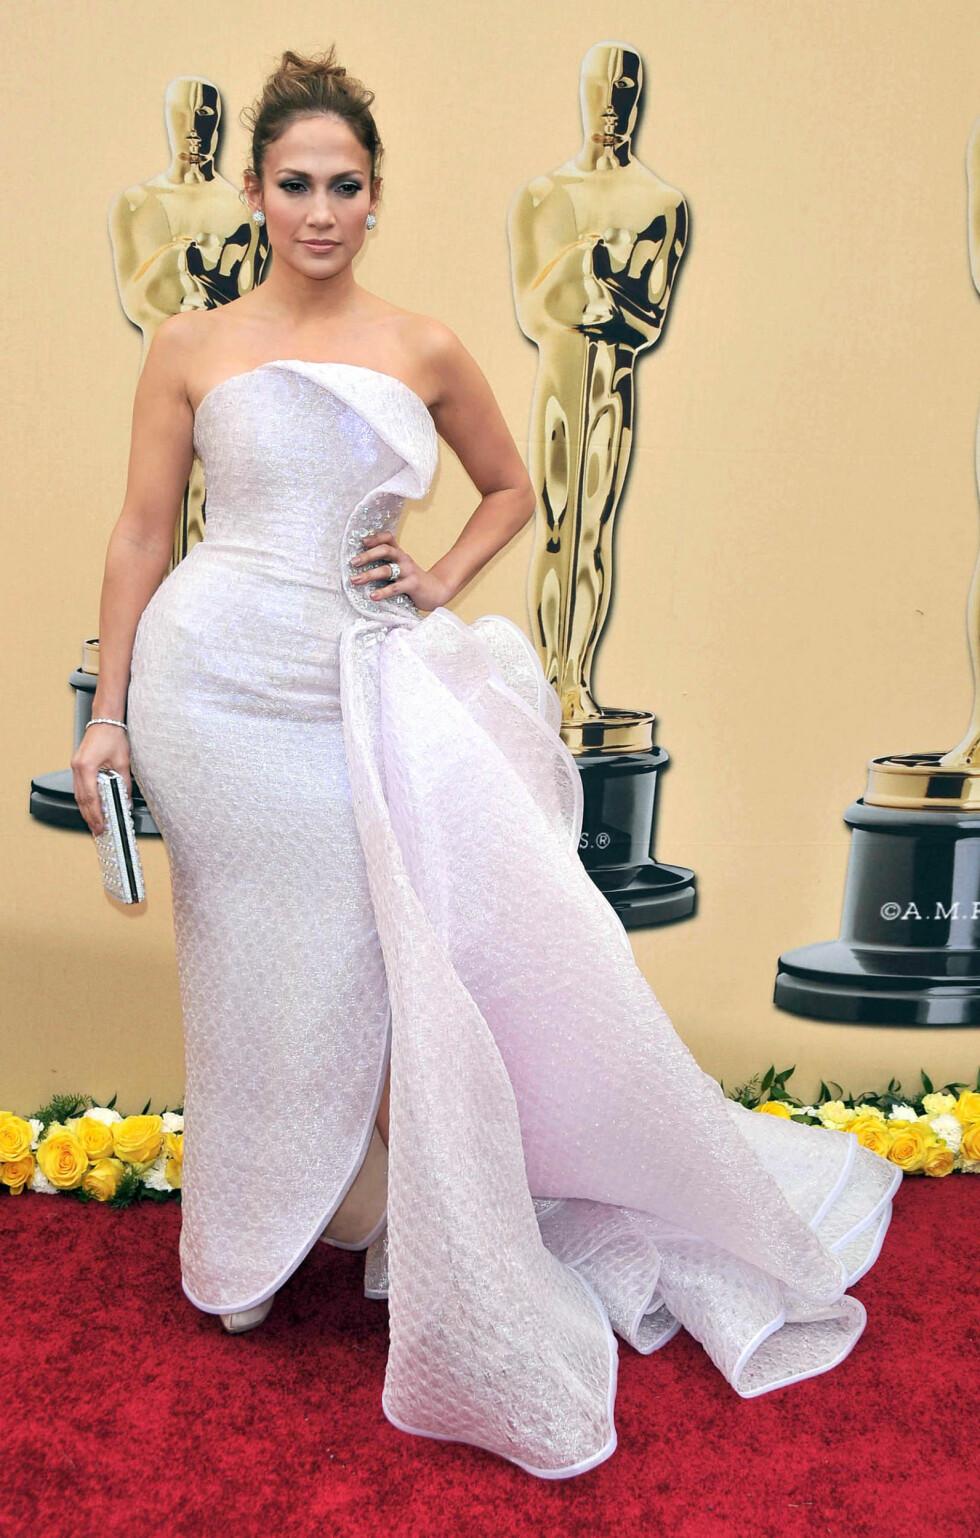 I 2010: Denne overdådige kjolen fra Armani Privé gjorde ikke den flotte figuren til Jennifer Lopez en eneste tjeneste. Foto: Image Press / Splash News/ All Over Press